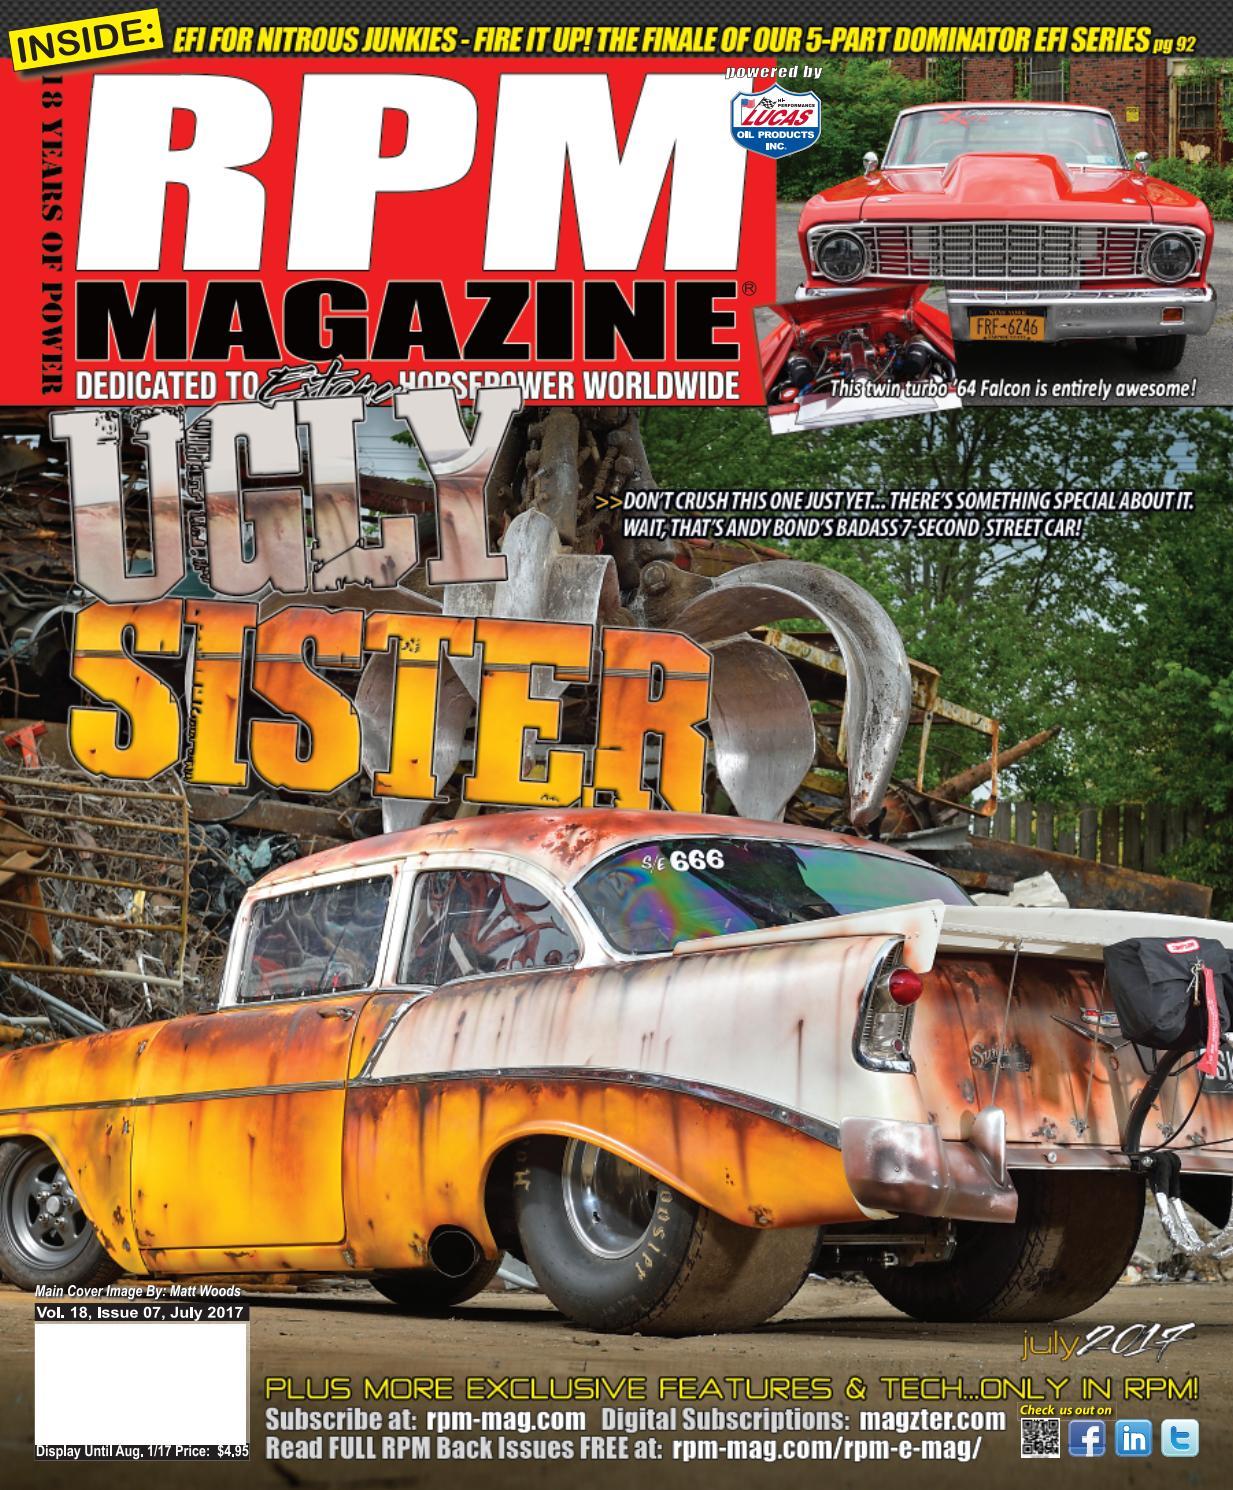 RPM Magazine July 2017 by RPM Magazine - issuu